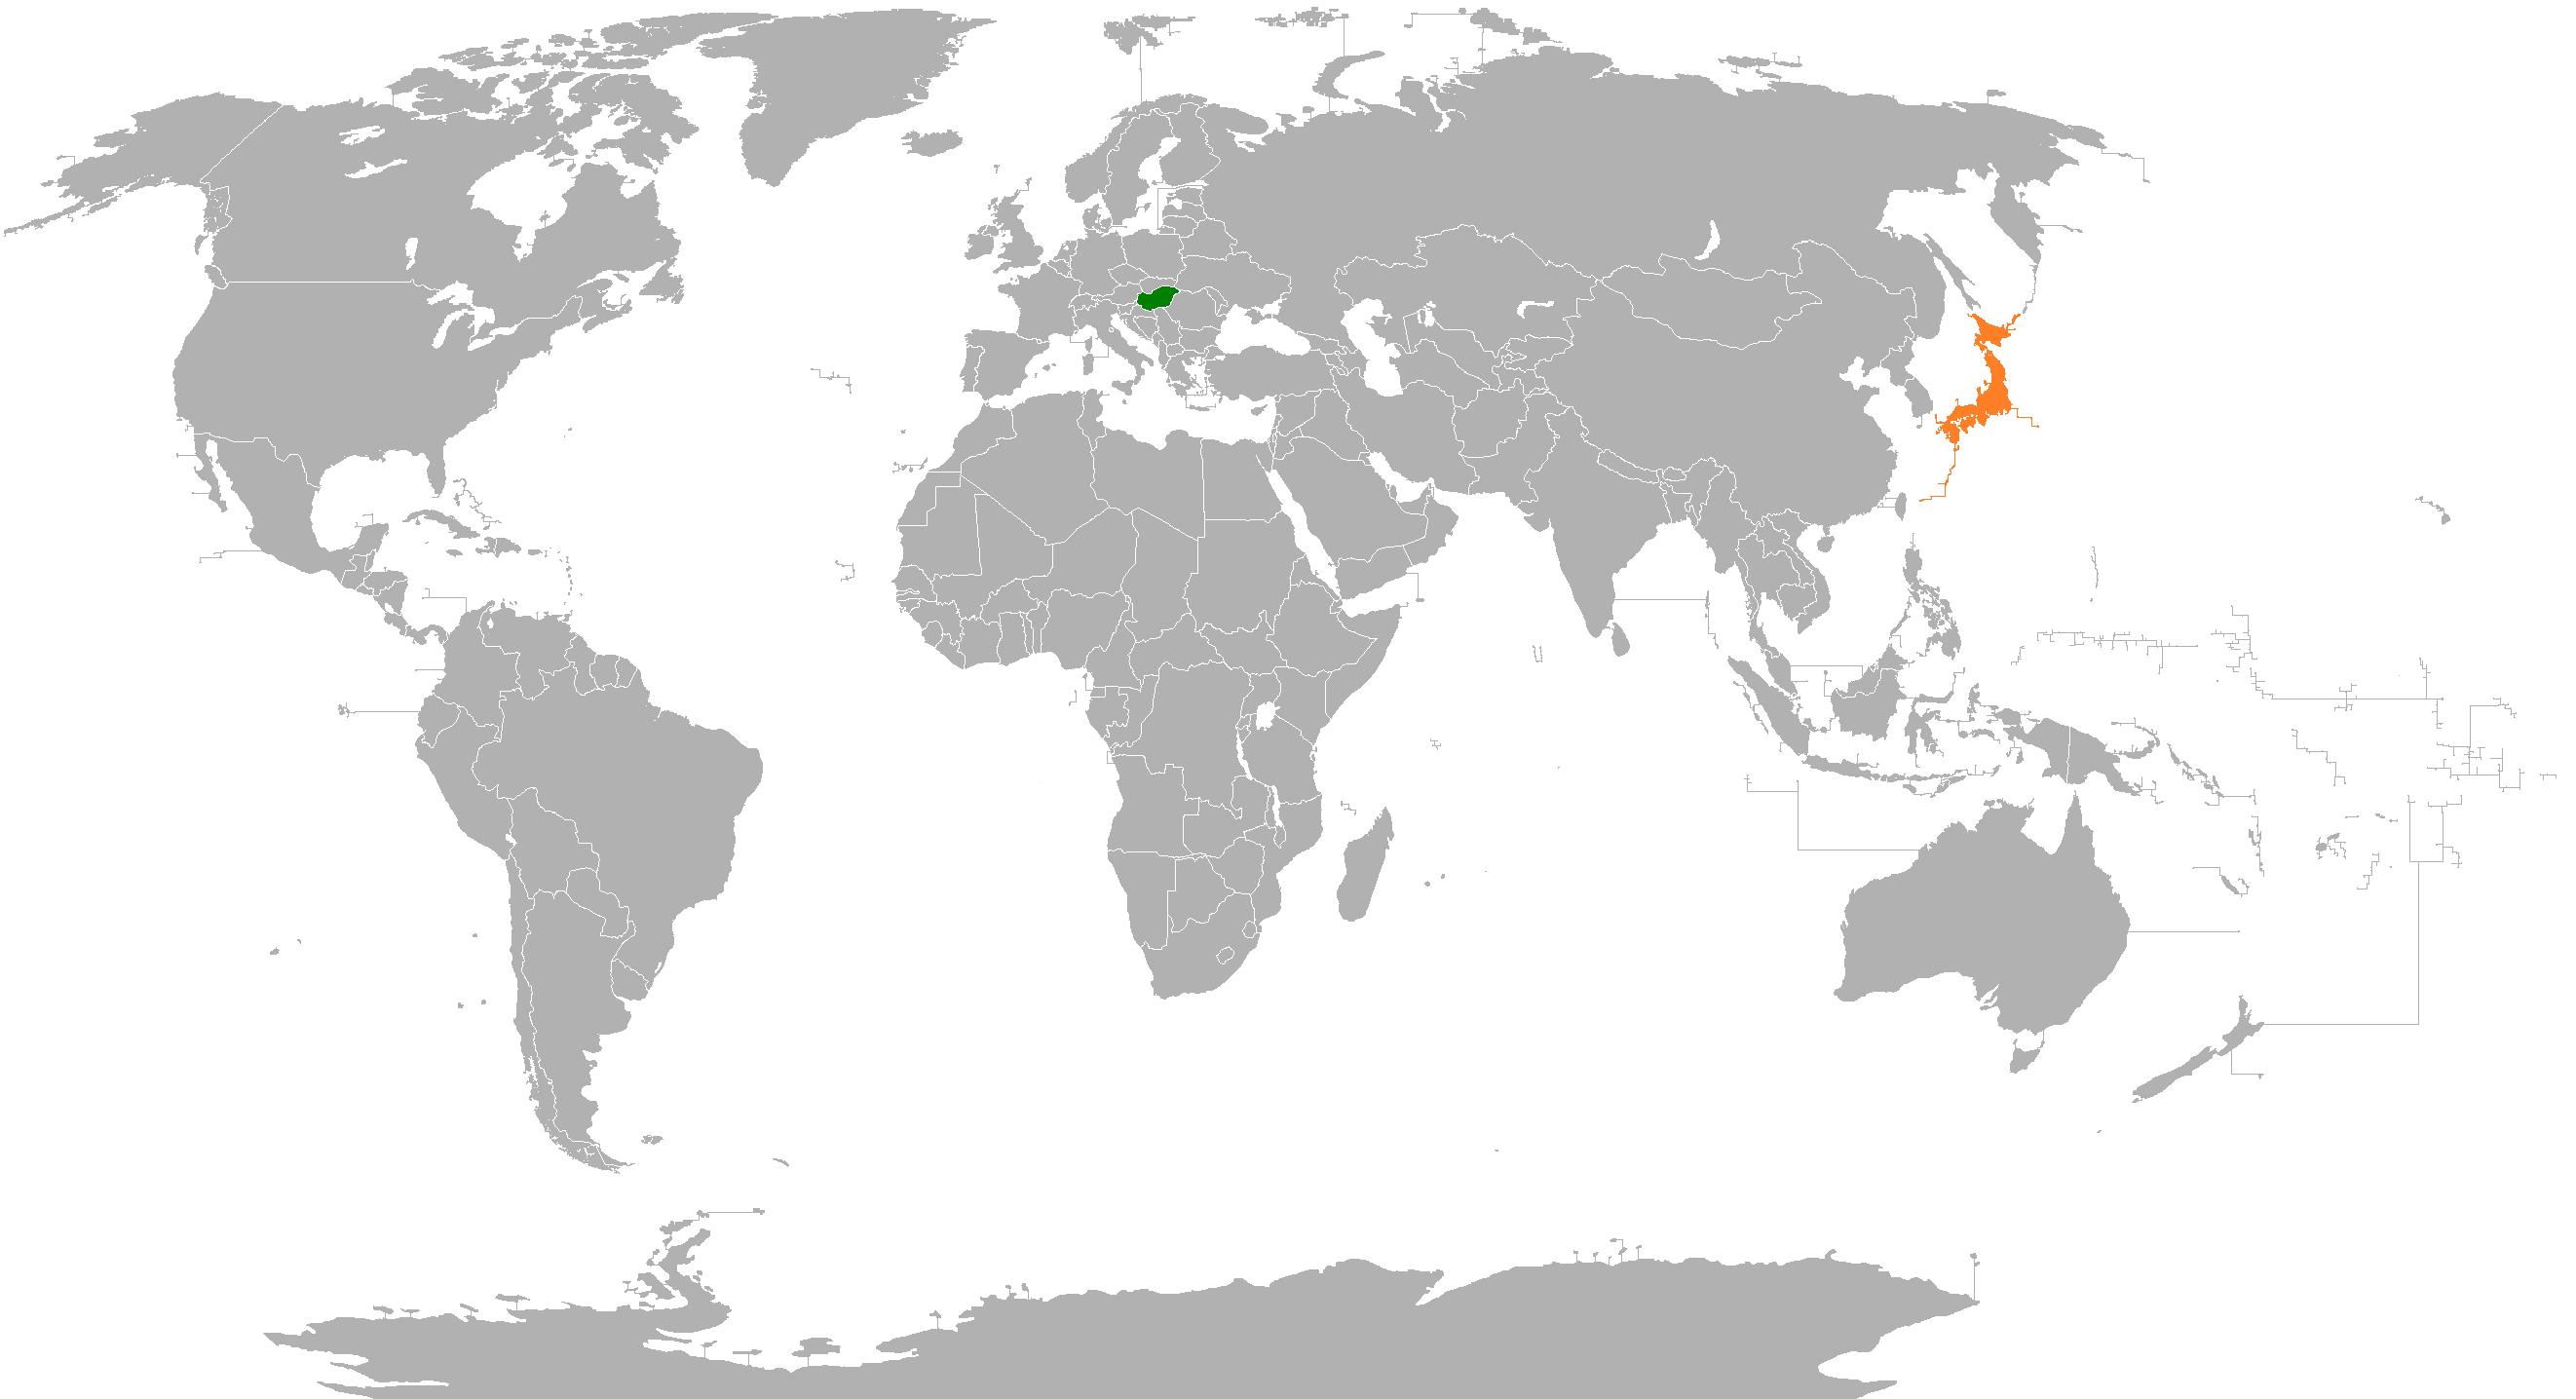 Filehungary japan locatorg wikimedia commons filehungary japan locatorg gumiabroncs Images